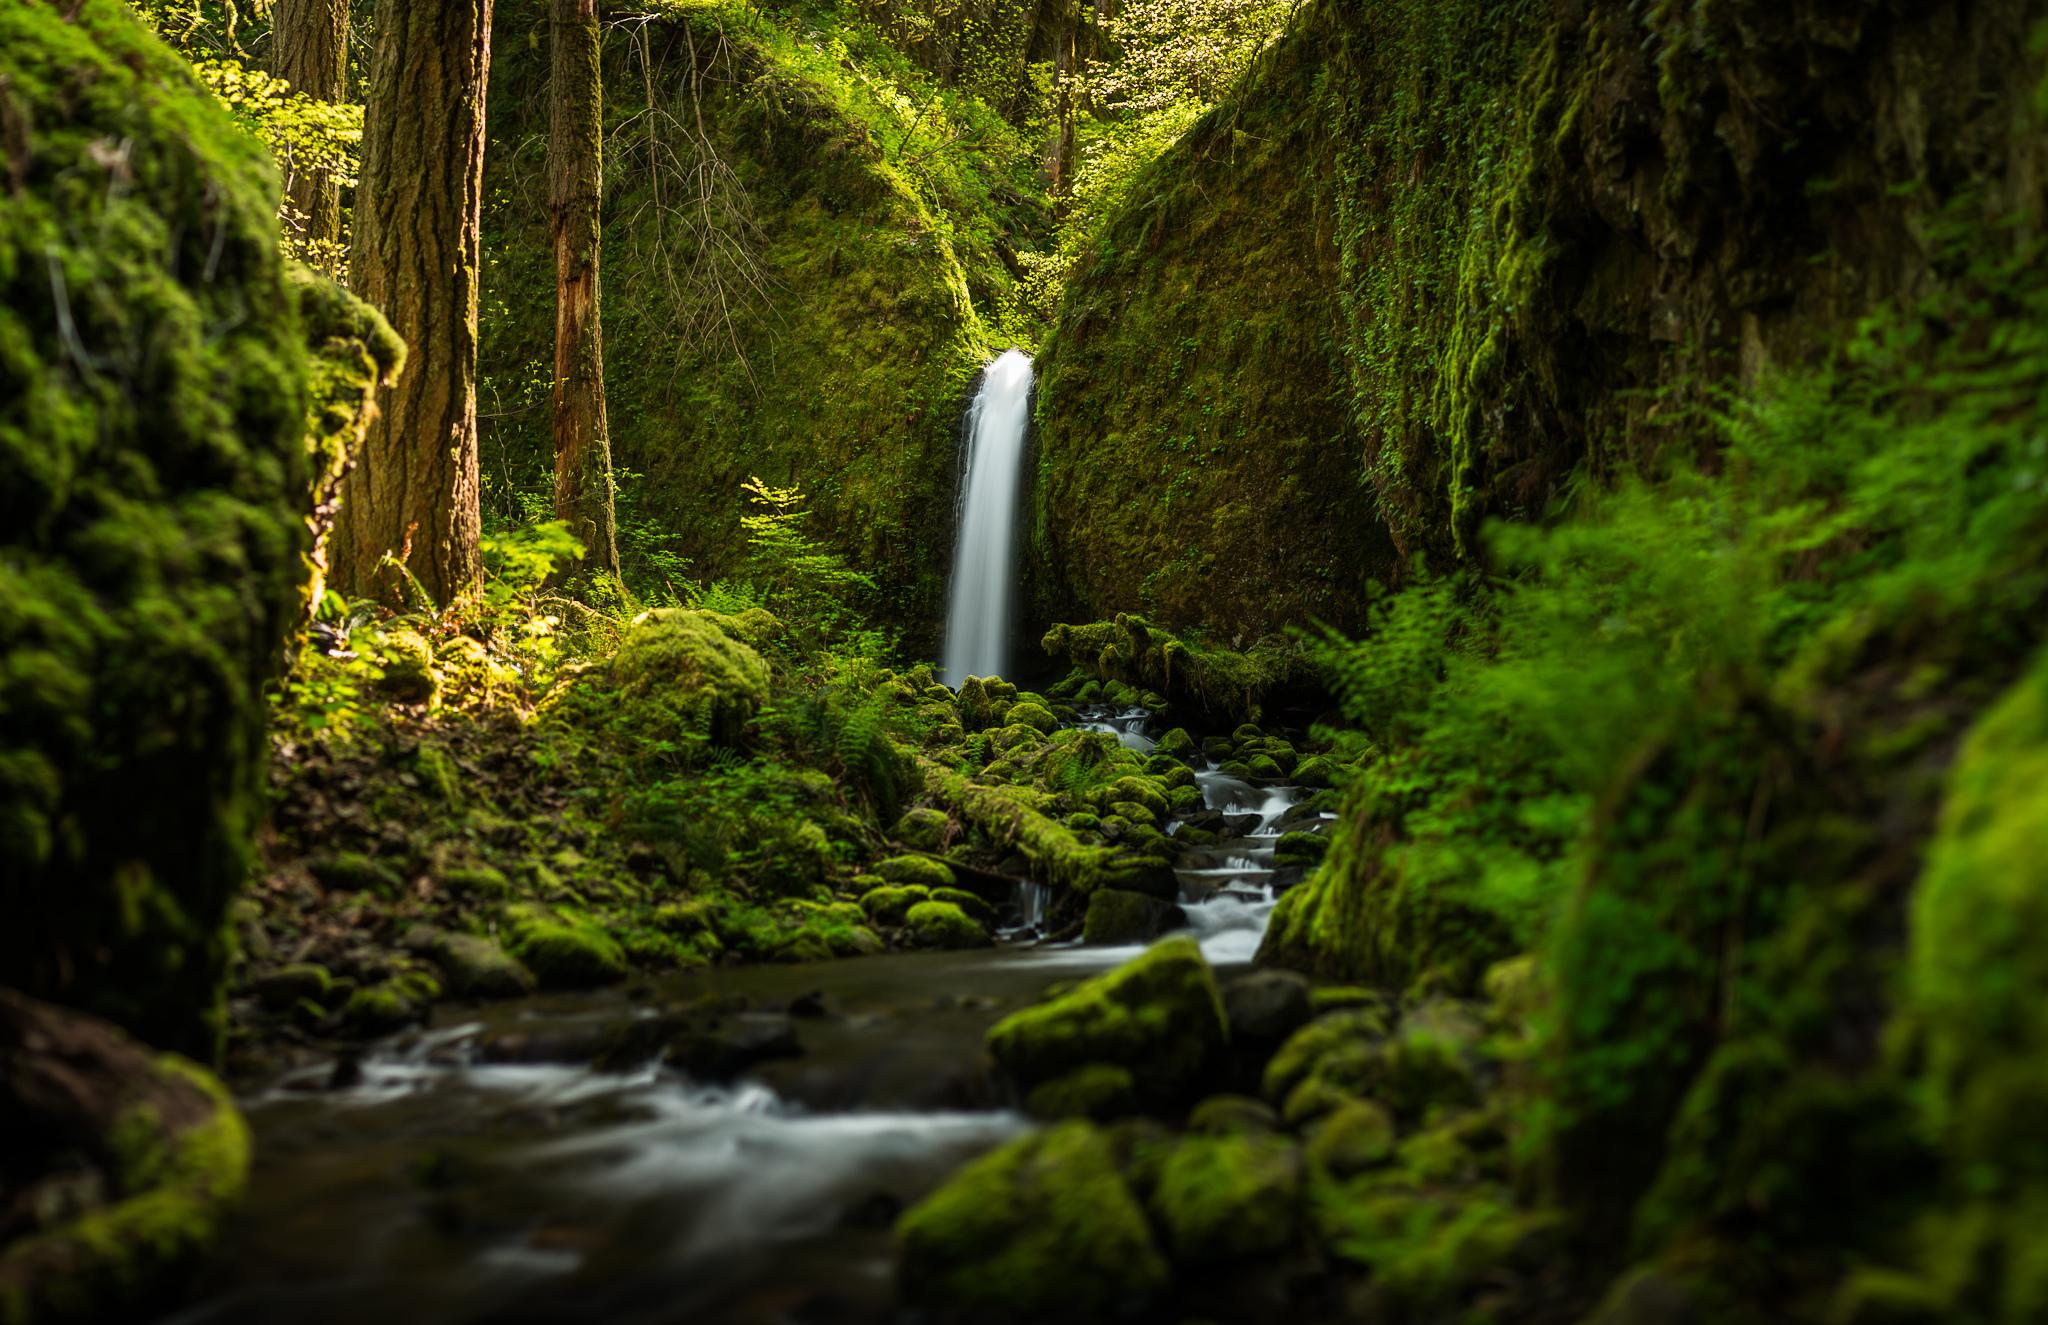 oregon wallpaper forest nature